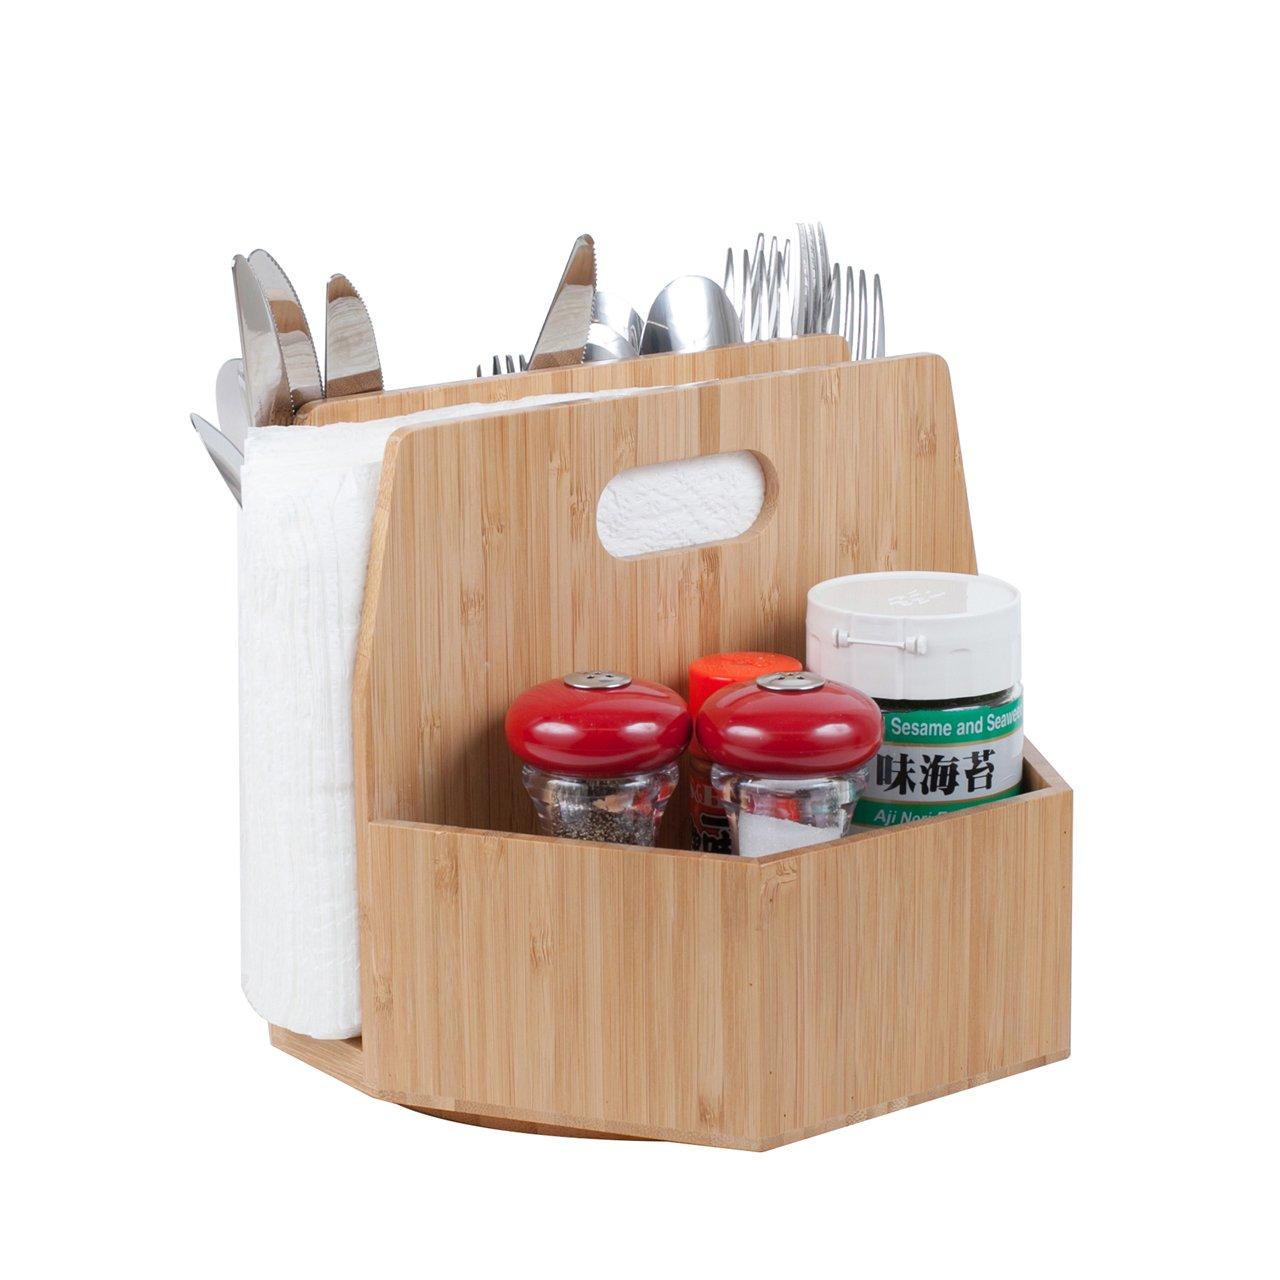 Bamboo Rotating Utensil Holder Portable Silverware Caddy, Condiment, Dining & Kitchen Organizer, Makeup Holder, Desktop, Classroom Supplies Organizer